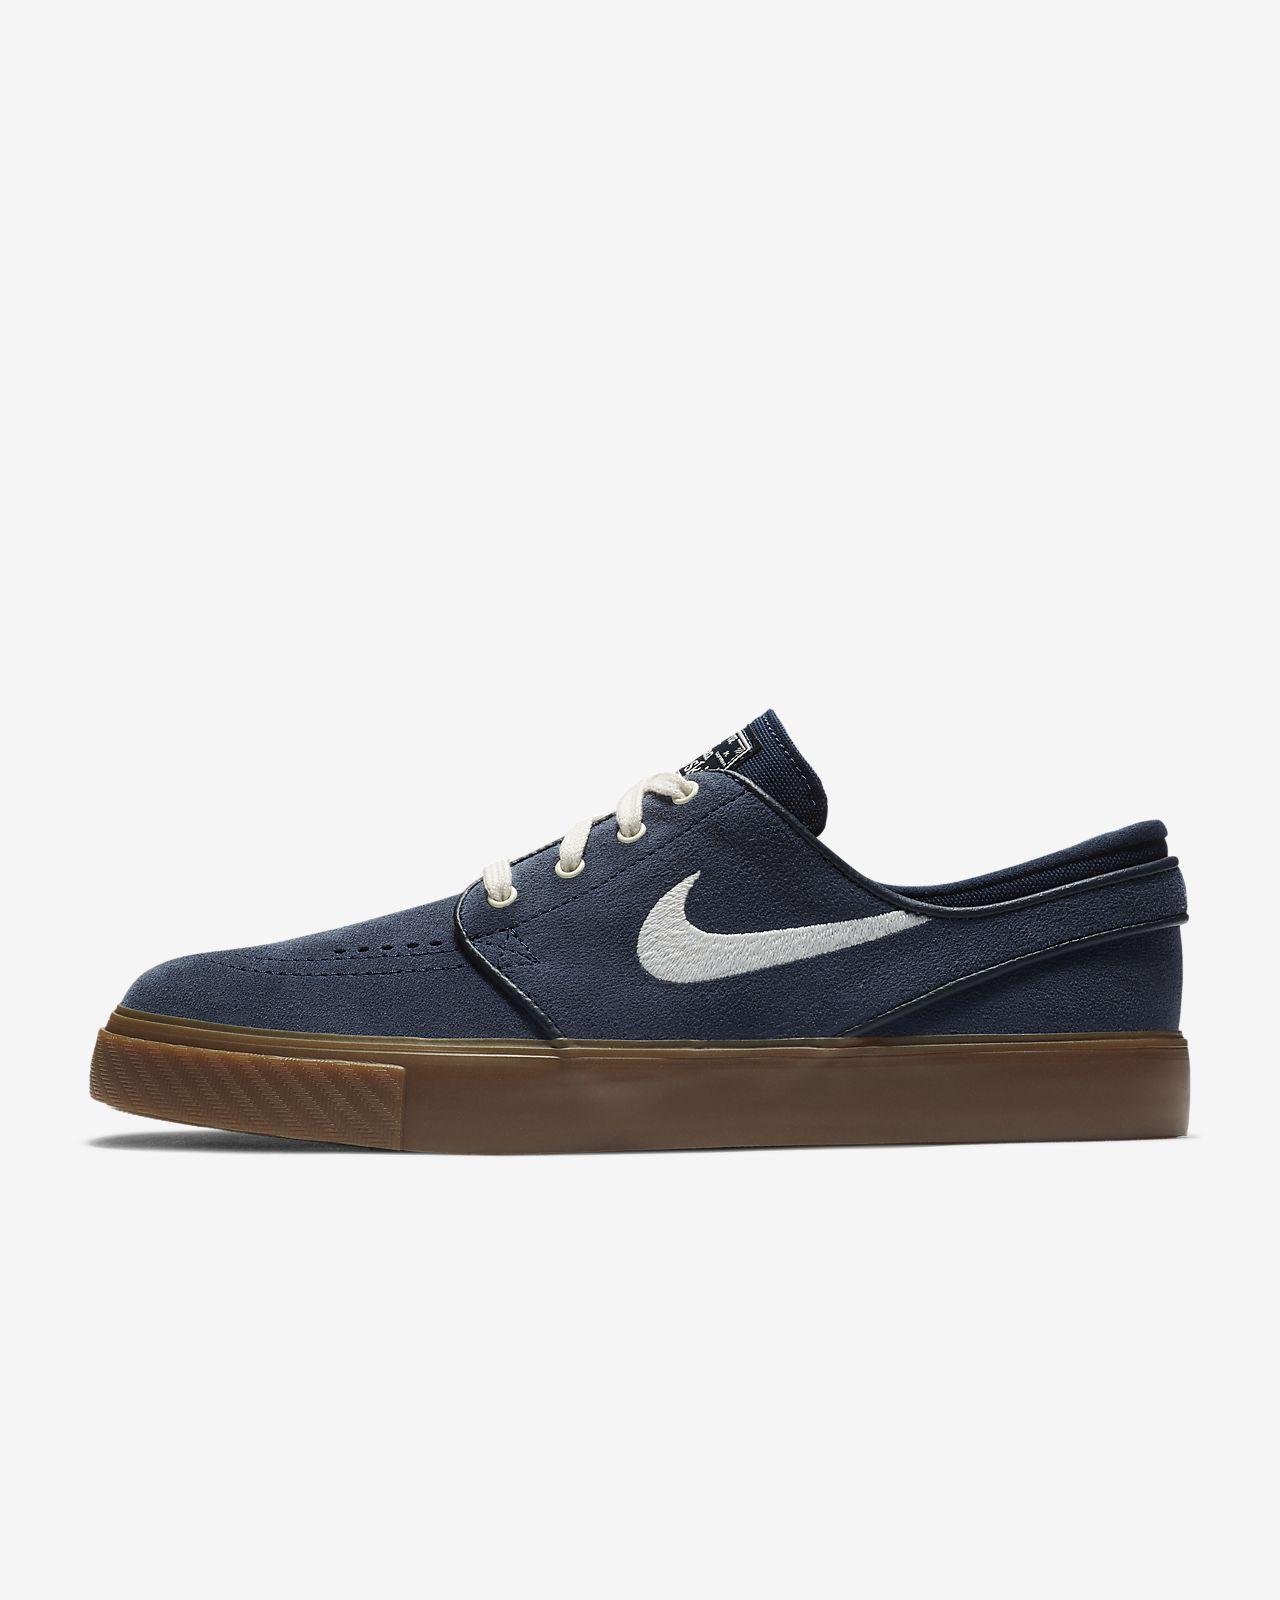 cheap for discount 76c57 1105f ... Nike Zoom Stefan Janoski Damen-Skateboardschuh